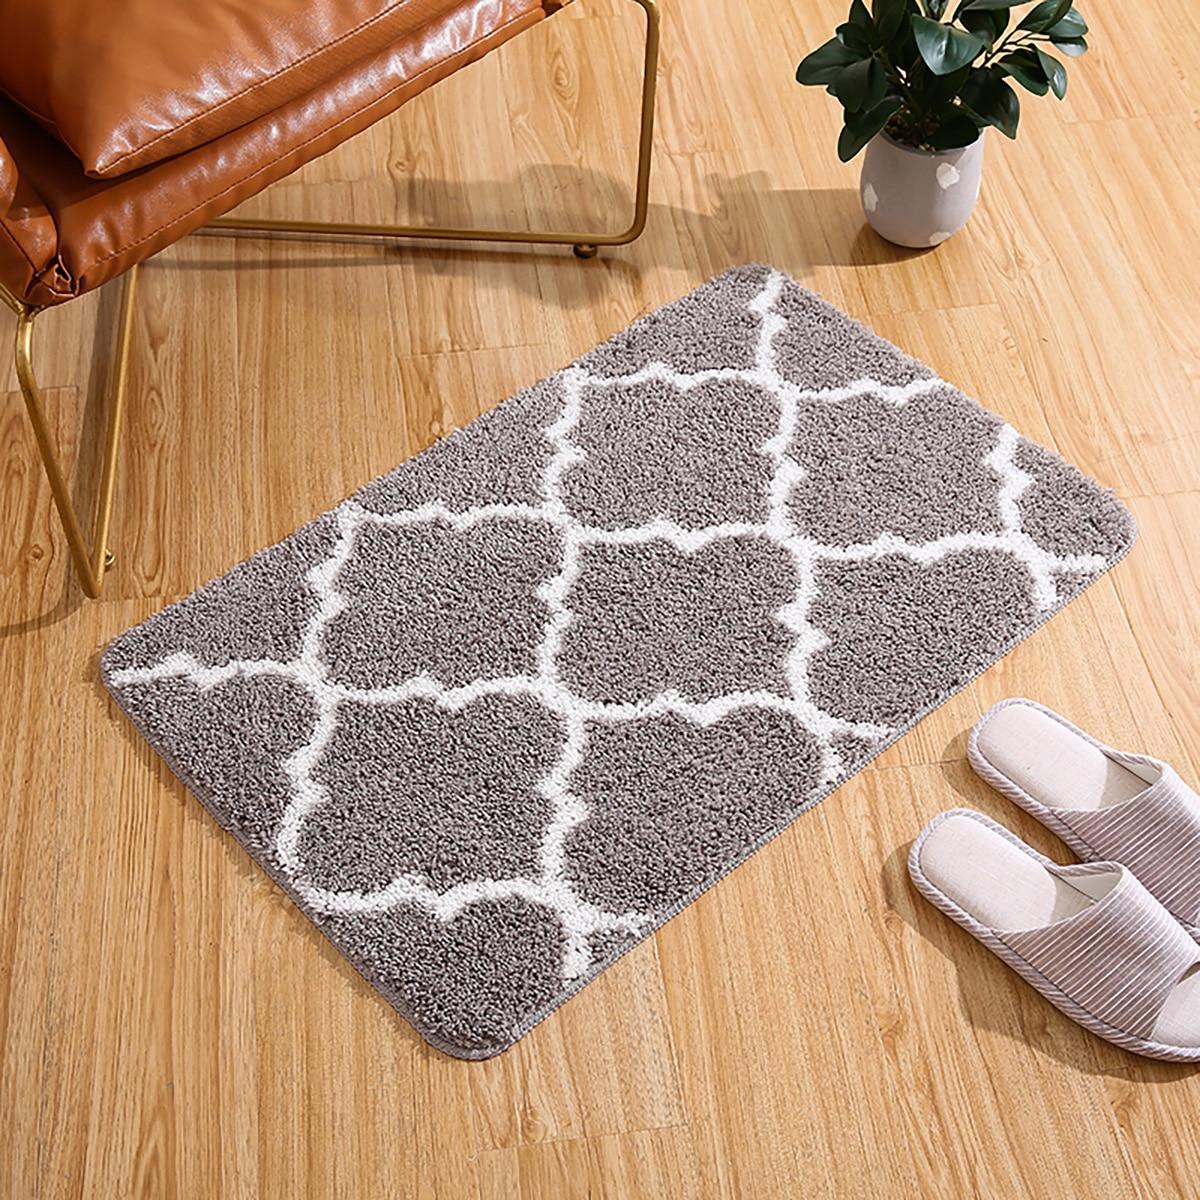 Bodenmatte mit Geometrie Muster